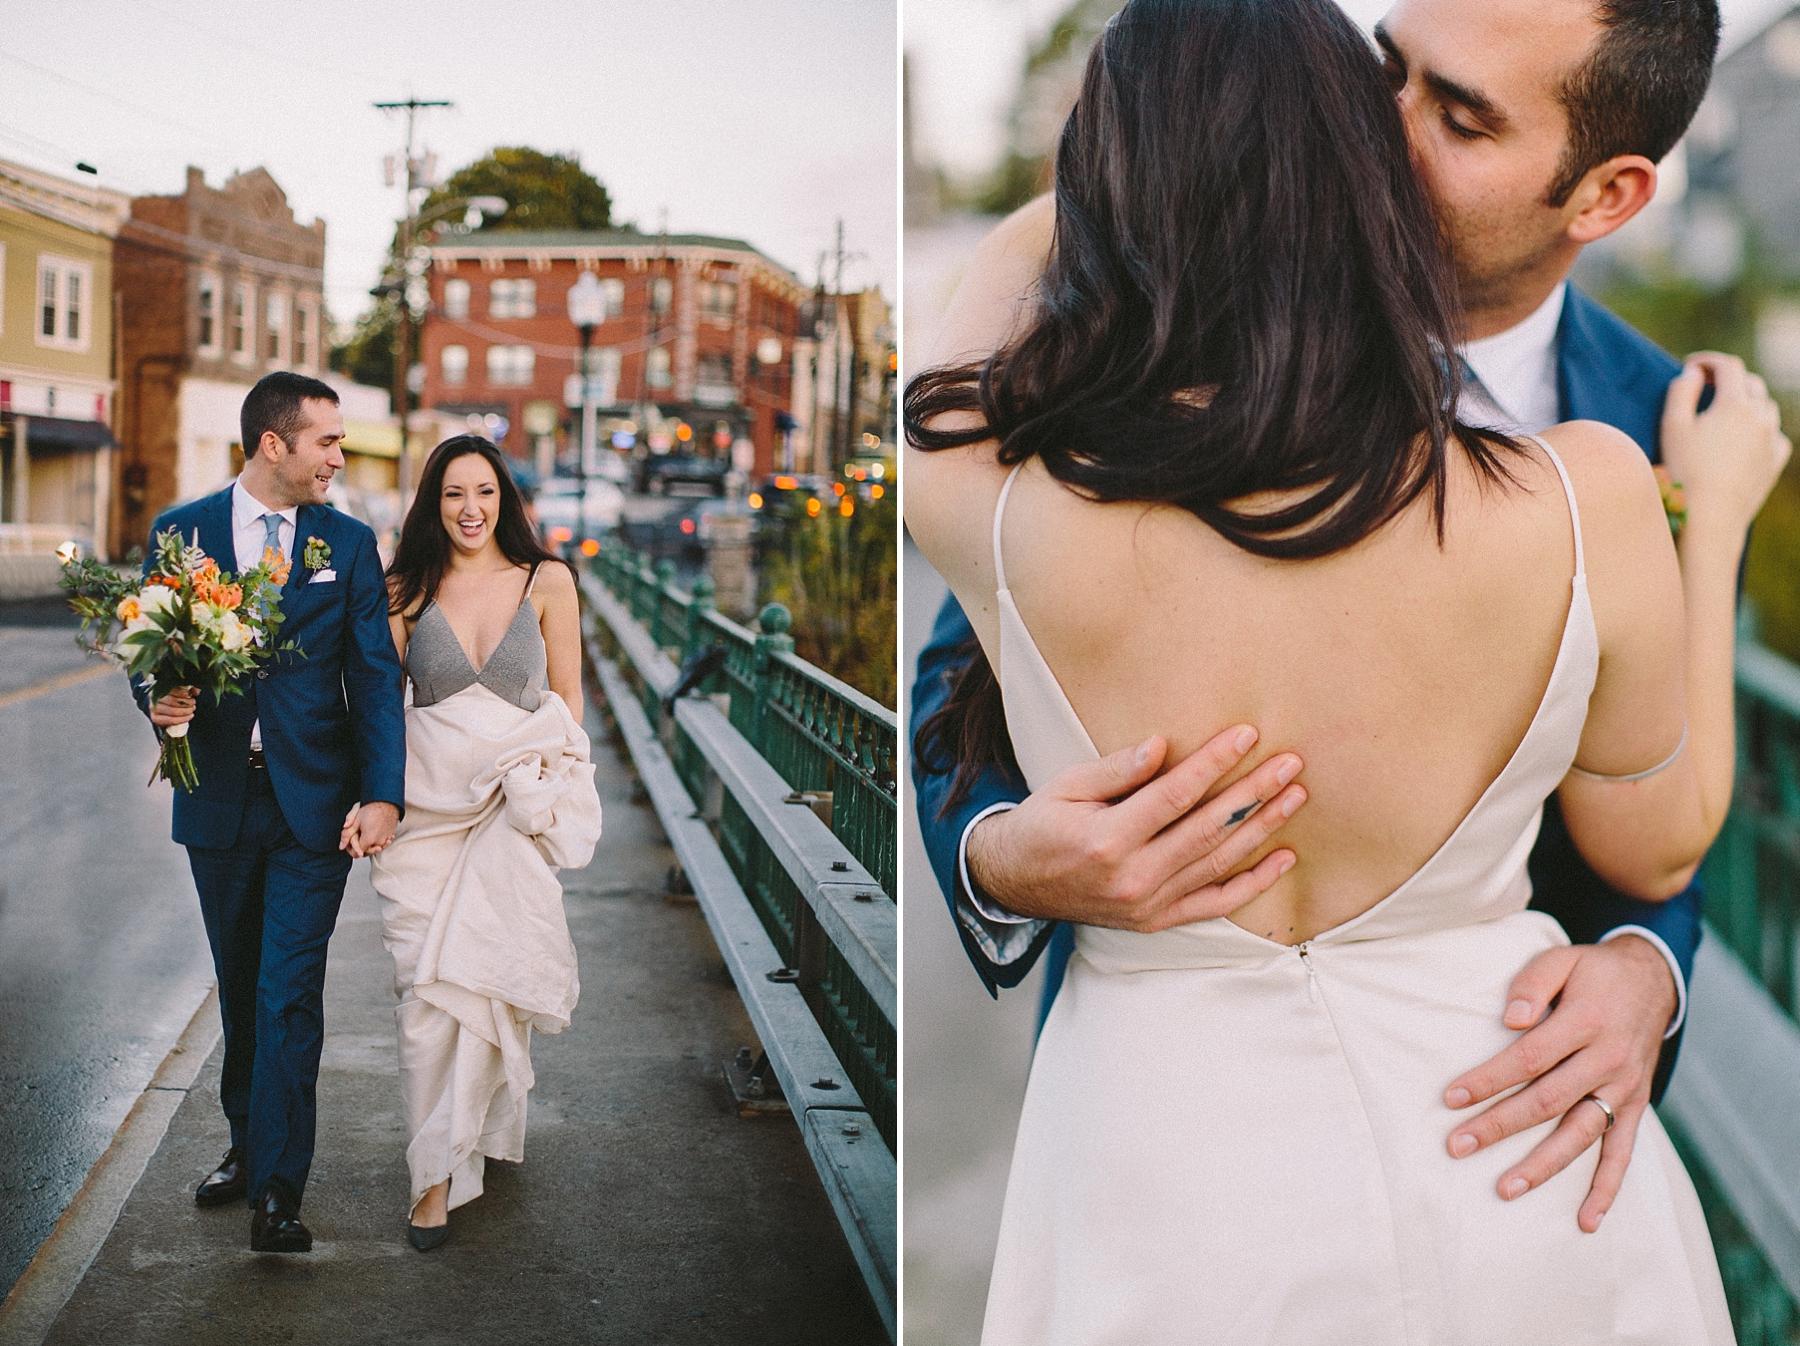 intimate-destination-wedding-photographer-outdoor_0121.jpg